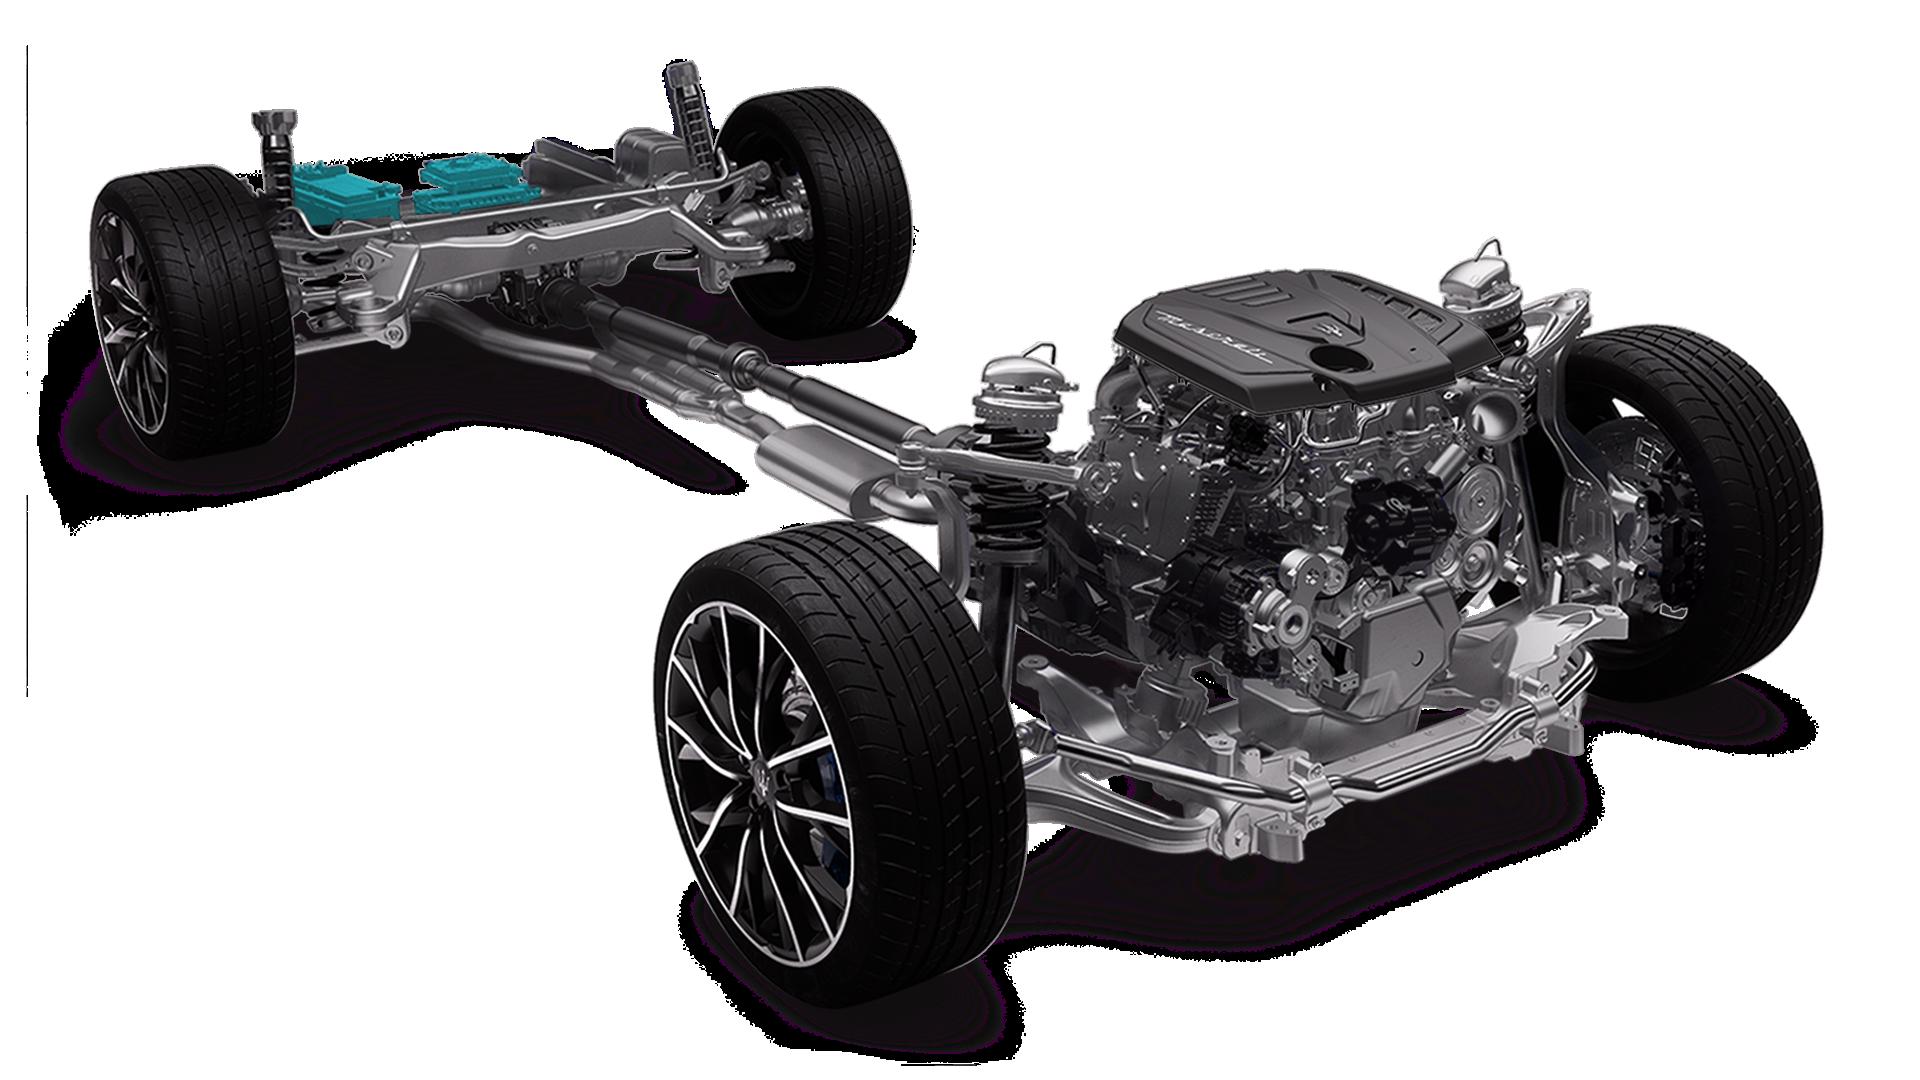 Maserati Ghibli Hybrid  - Weight distribution: DC/DC Converter and 48V Engine